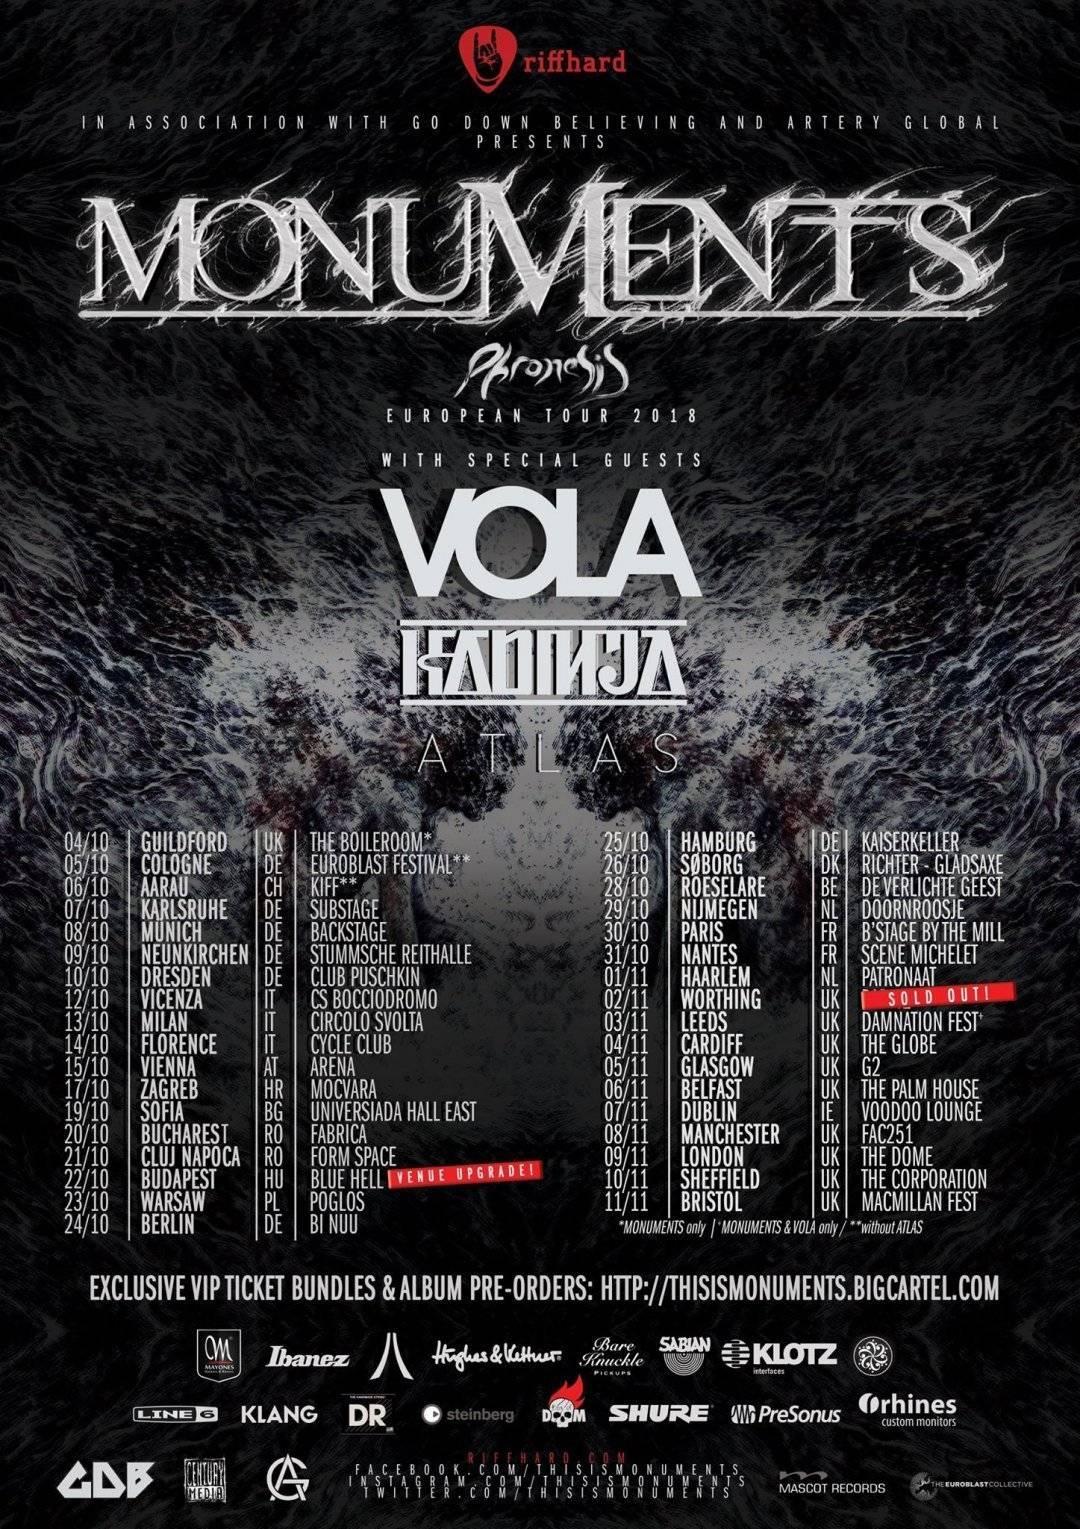 Monuments, Vola, Kadinja & Atlas in Munich, October 8 2018